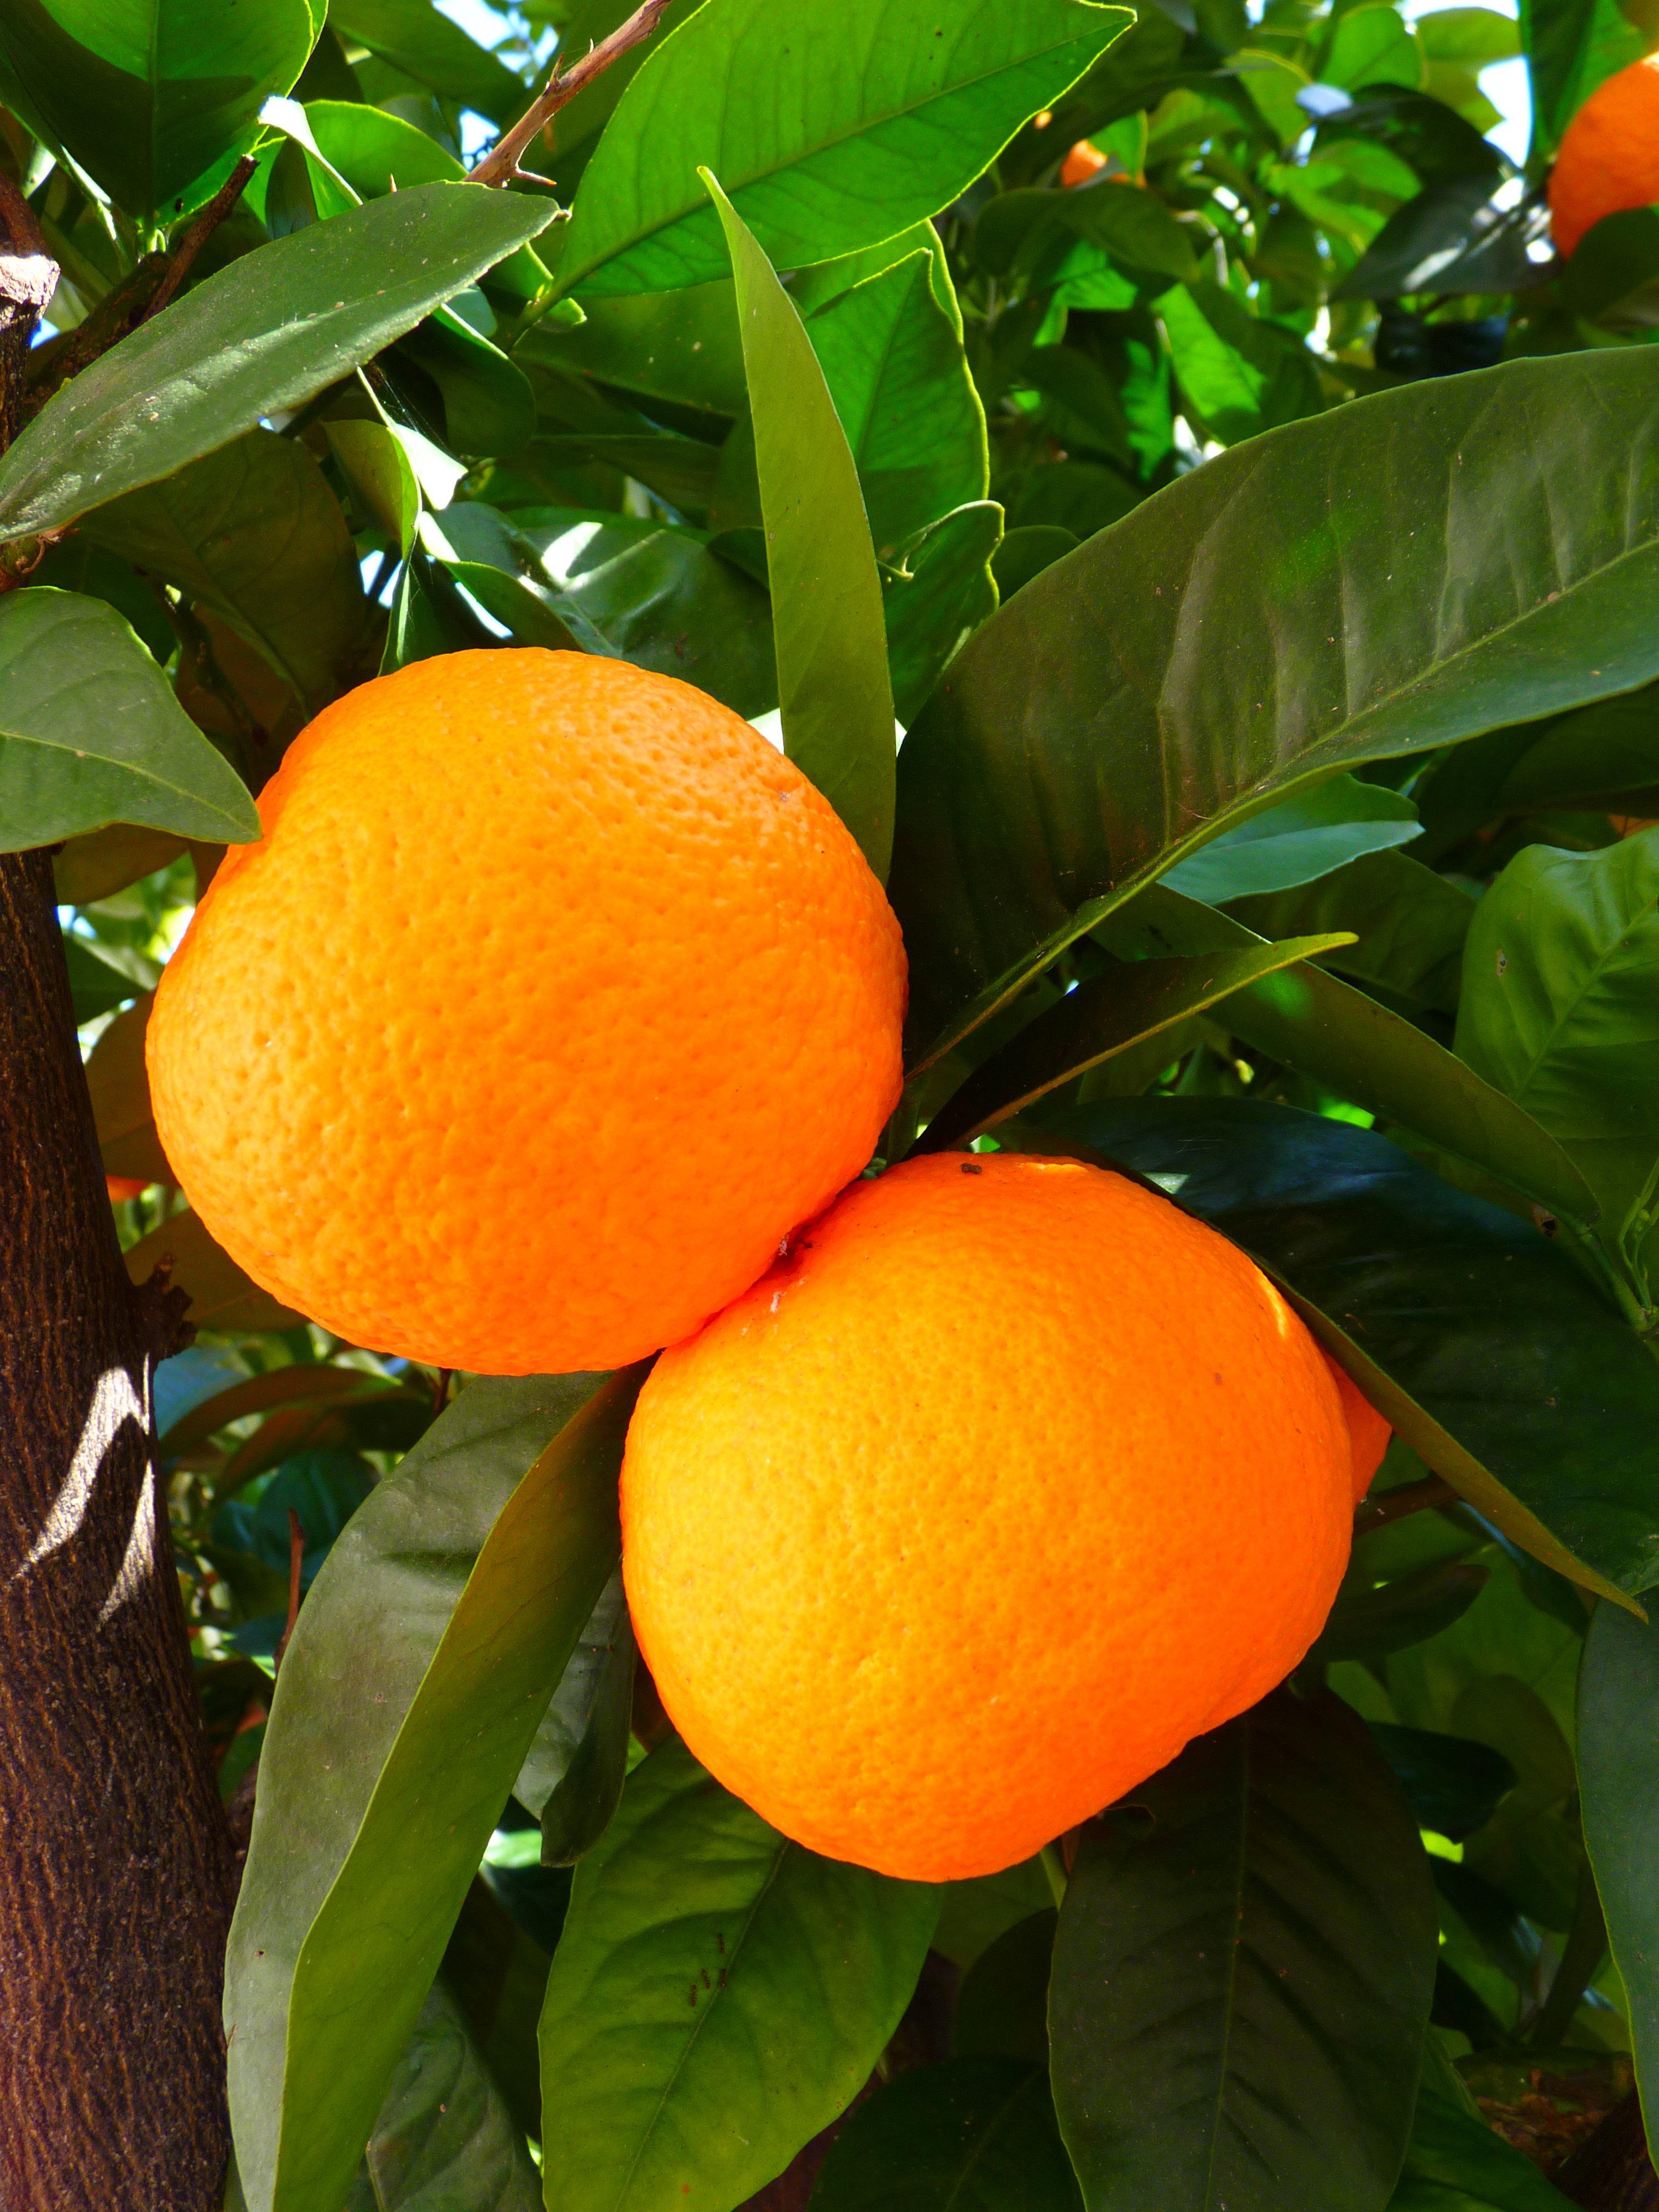 images feng shui - lefengshuifacile.com - oranges